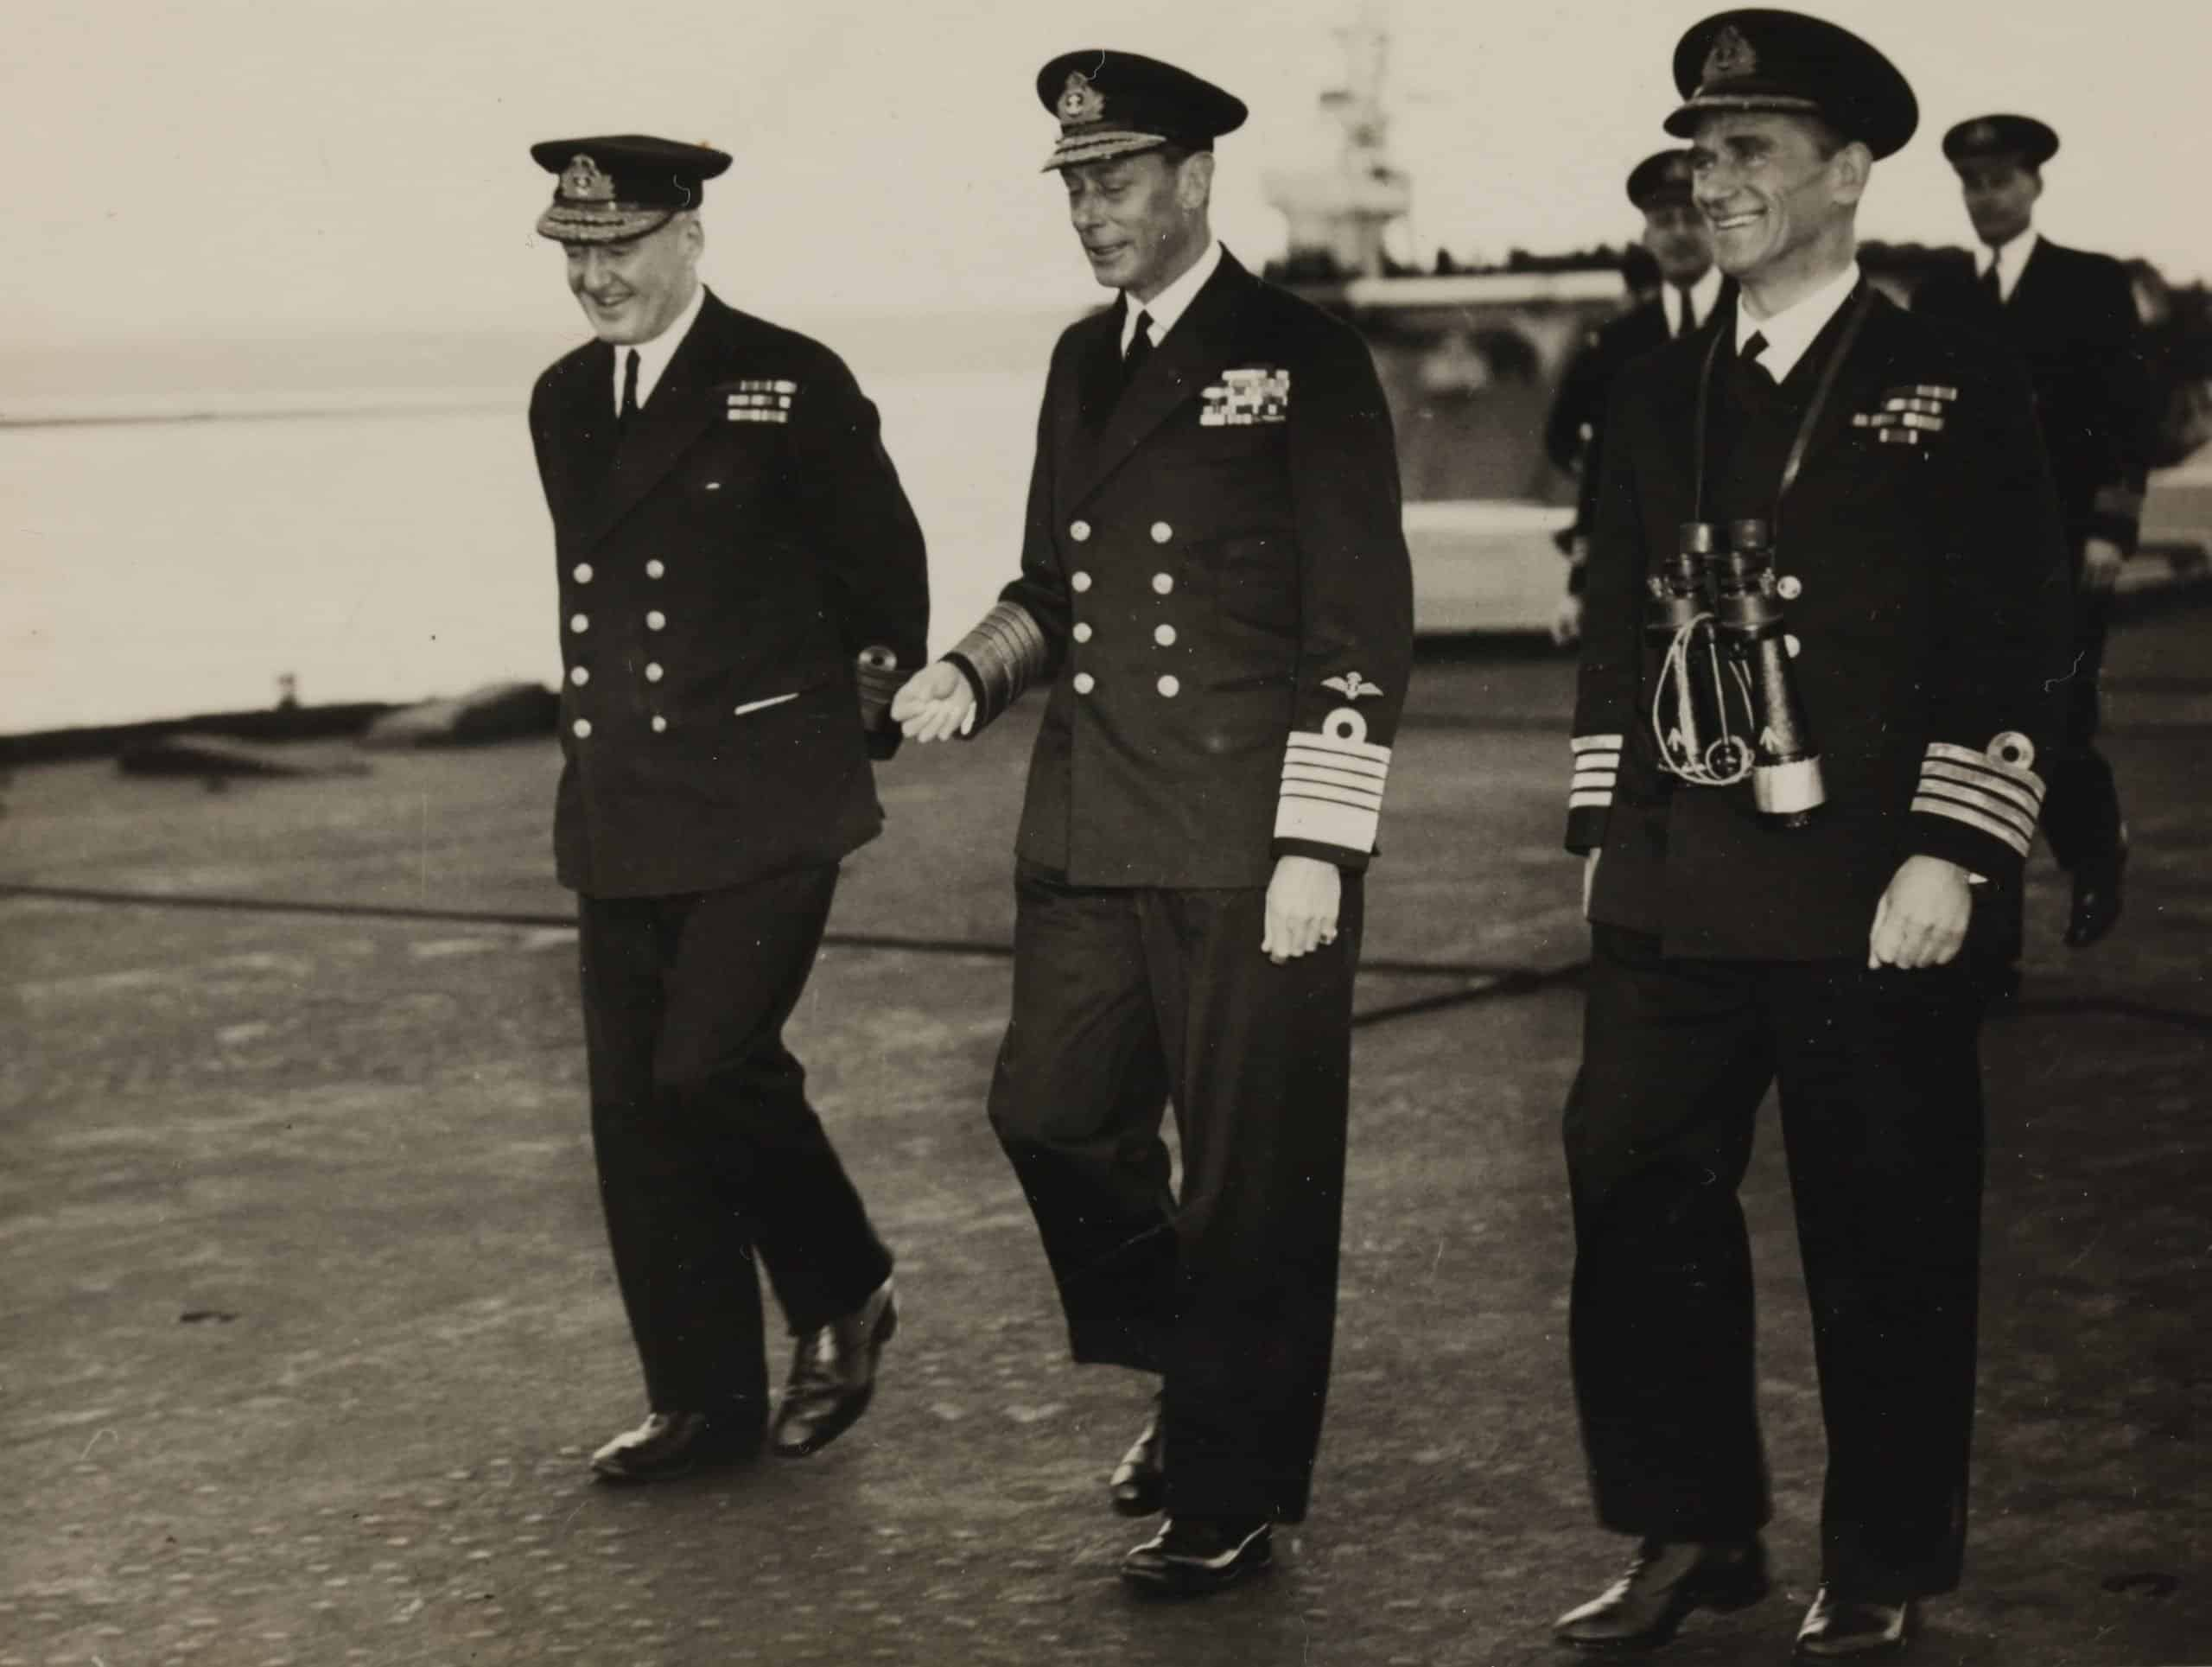 King George VI, Able Seaman David Ralph Goodwin, circa 1950